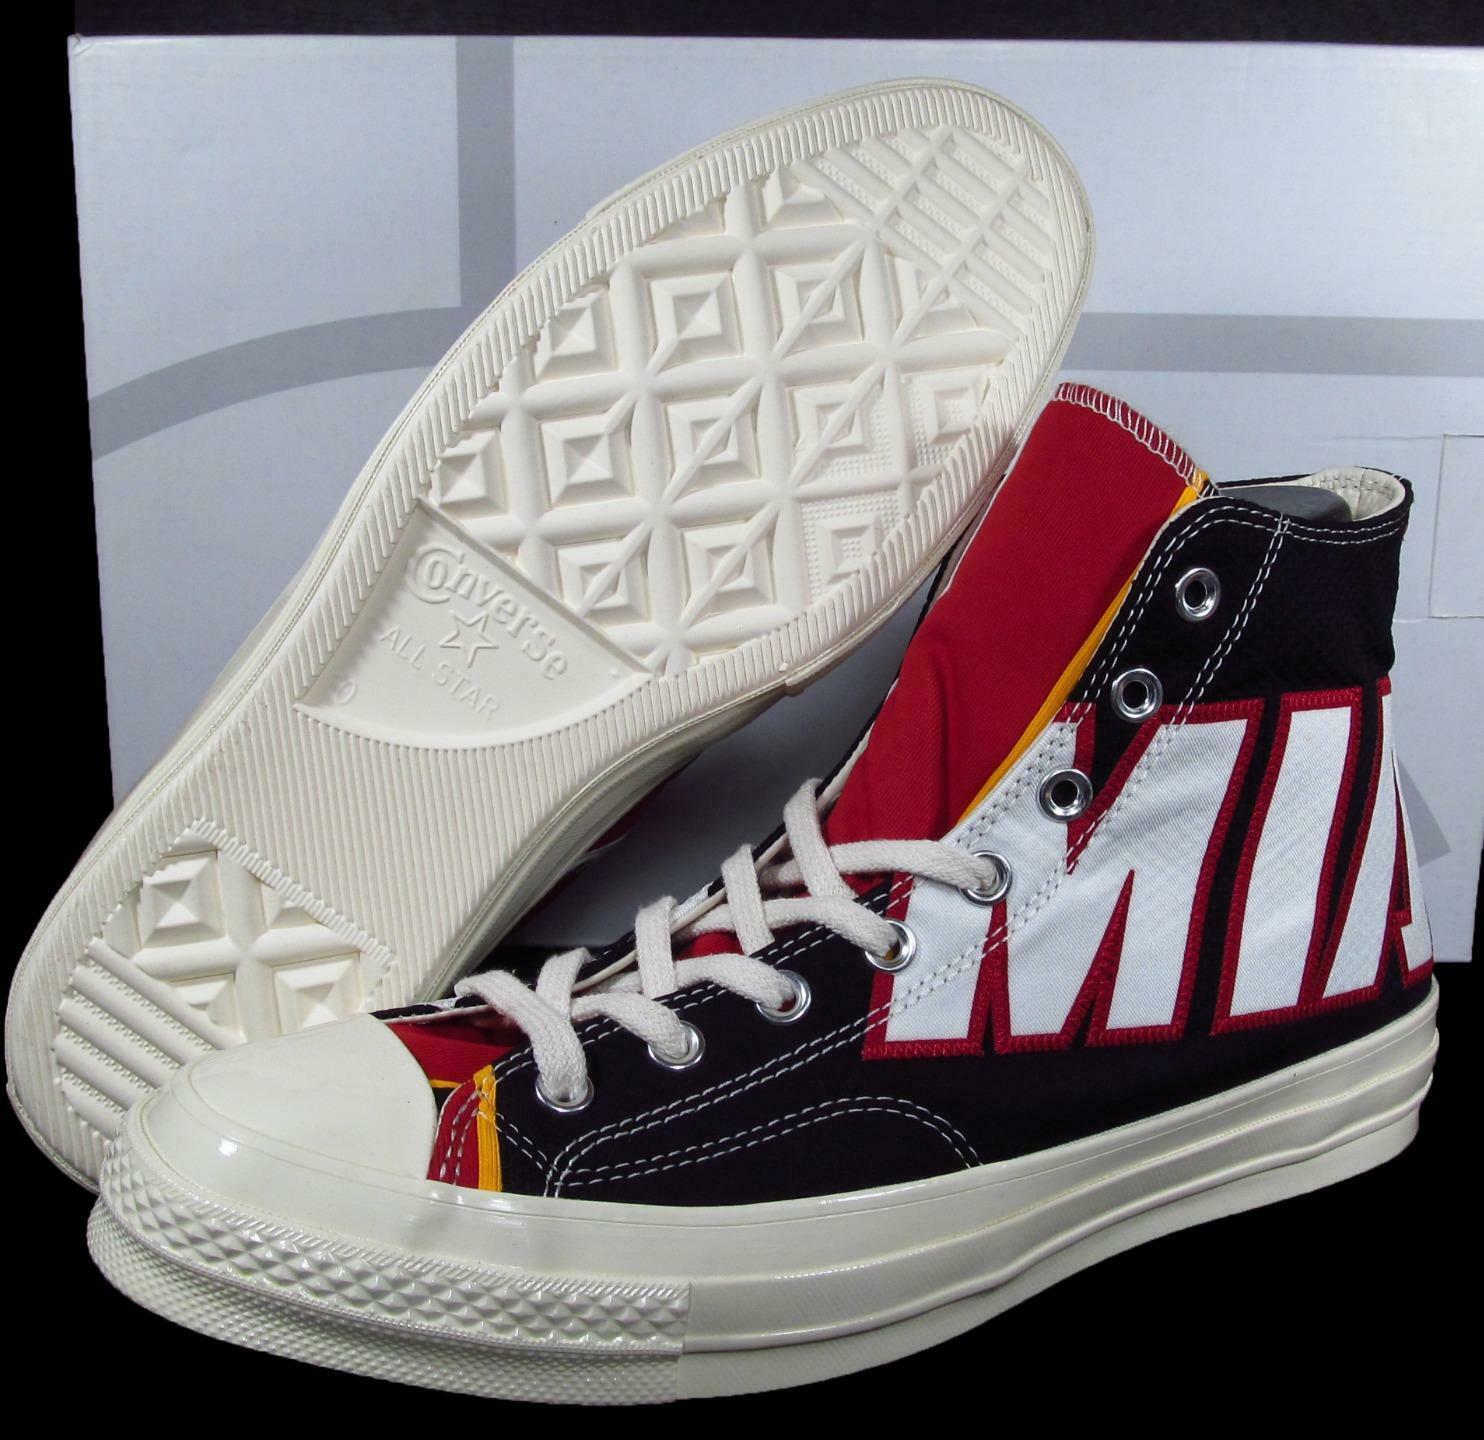 Converse Miami Heat Gameday Jersey Sneaker Chuck Taylor 70 Hi 40/250 (8 MEN) - $125.00